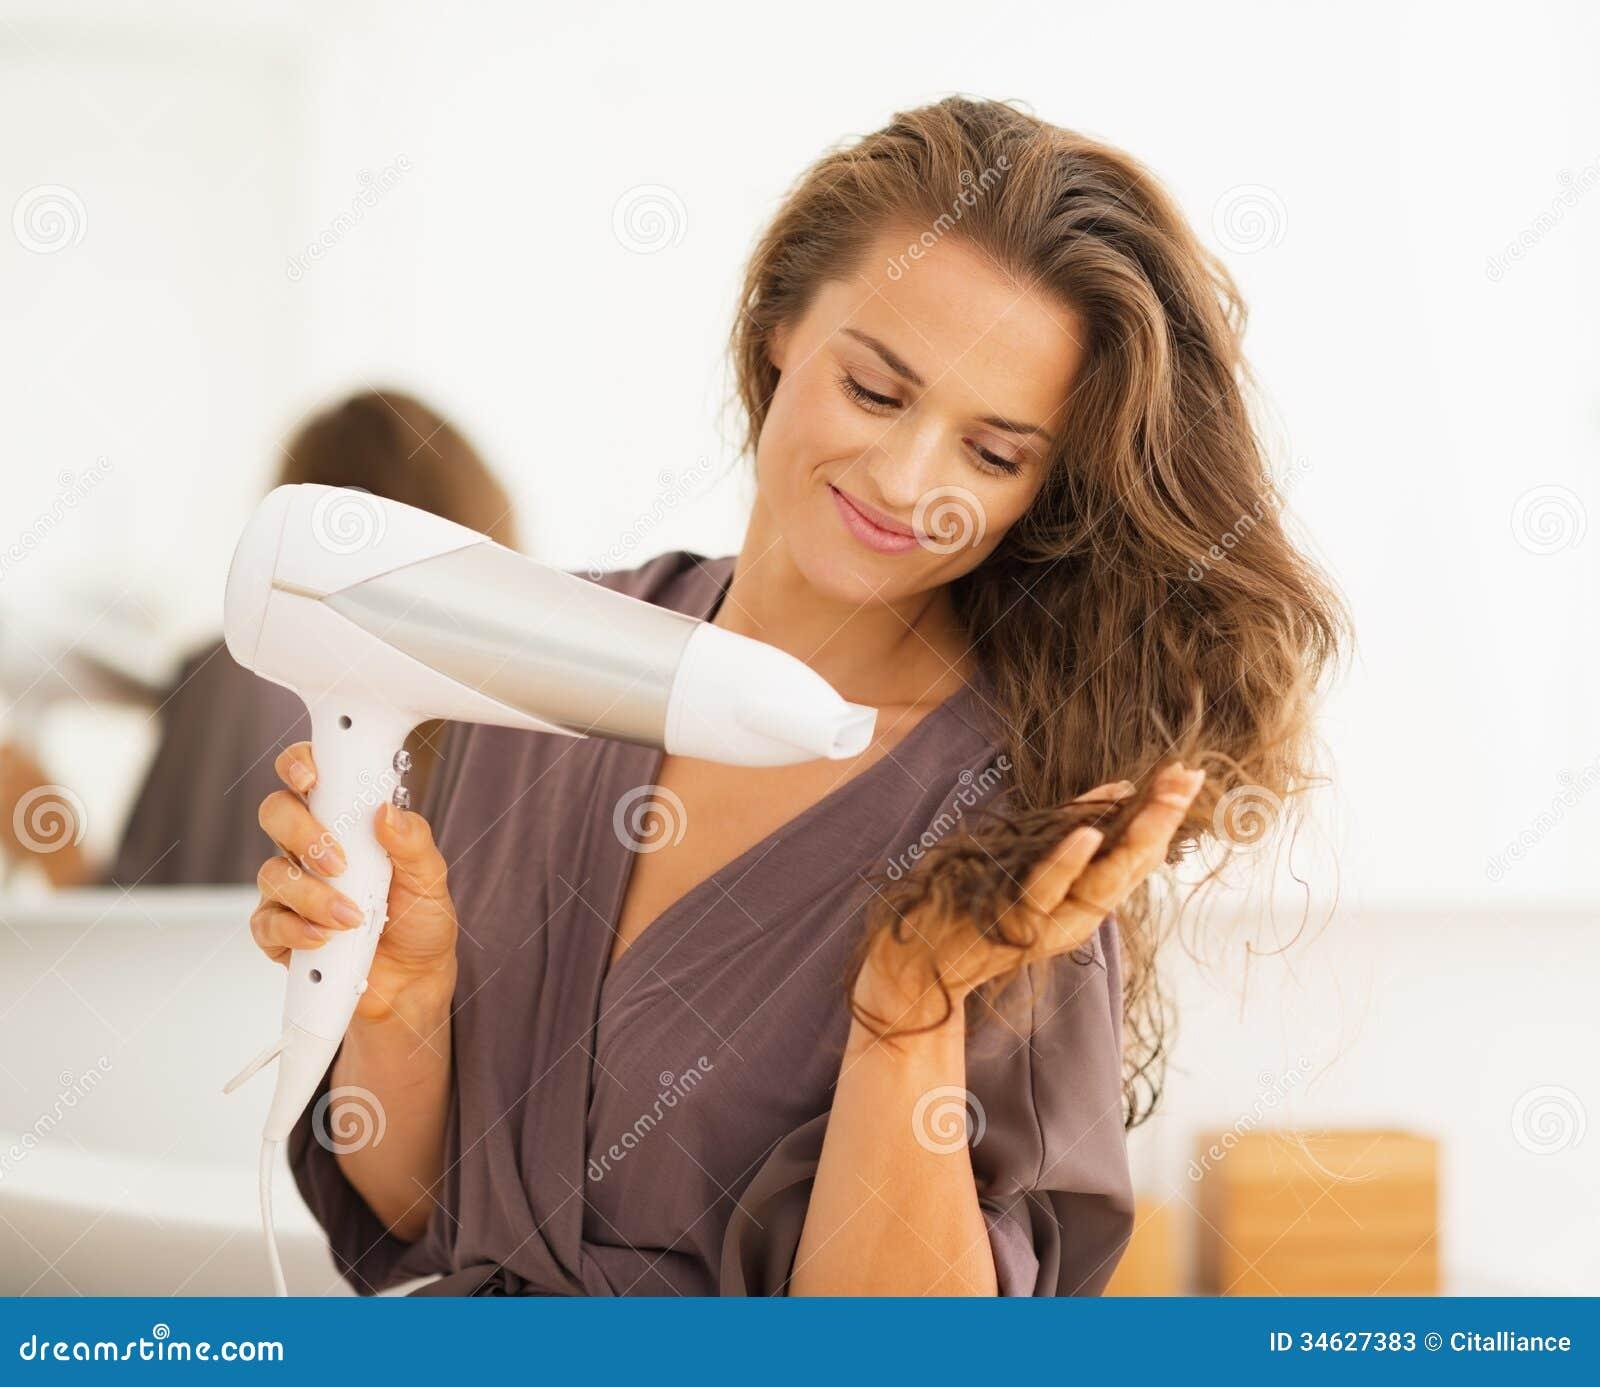 Happy Woman Blow Drying Hair In Bathroom Stock Image ...